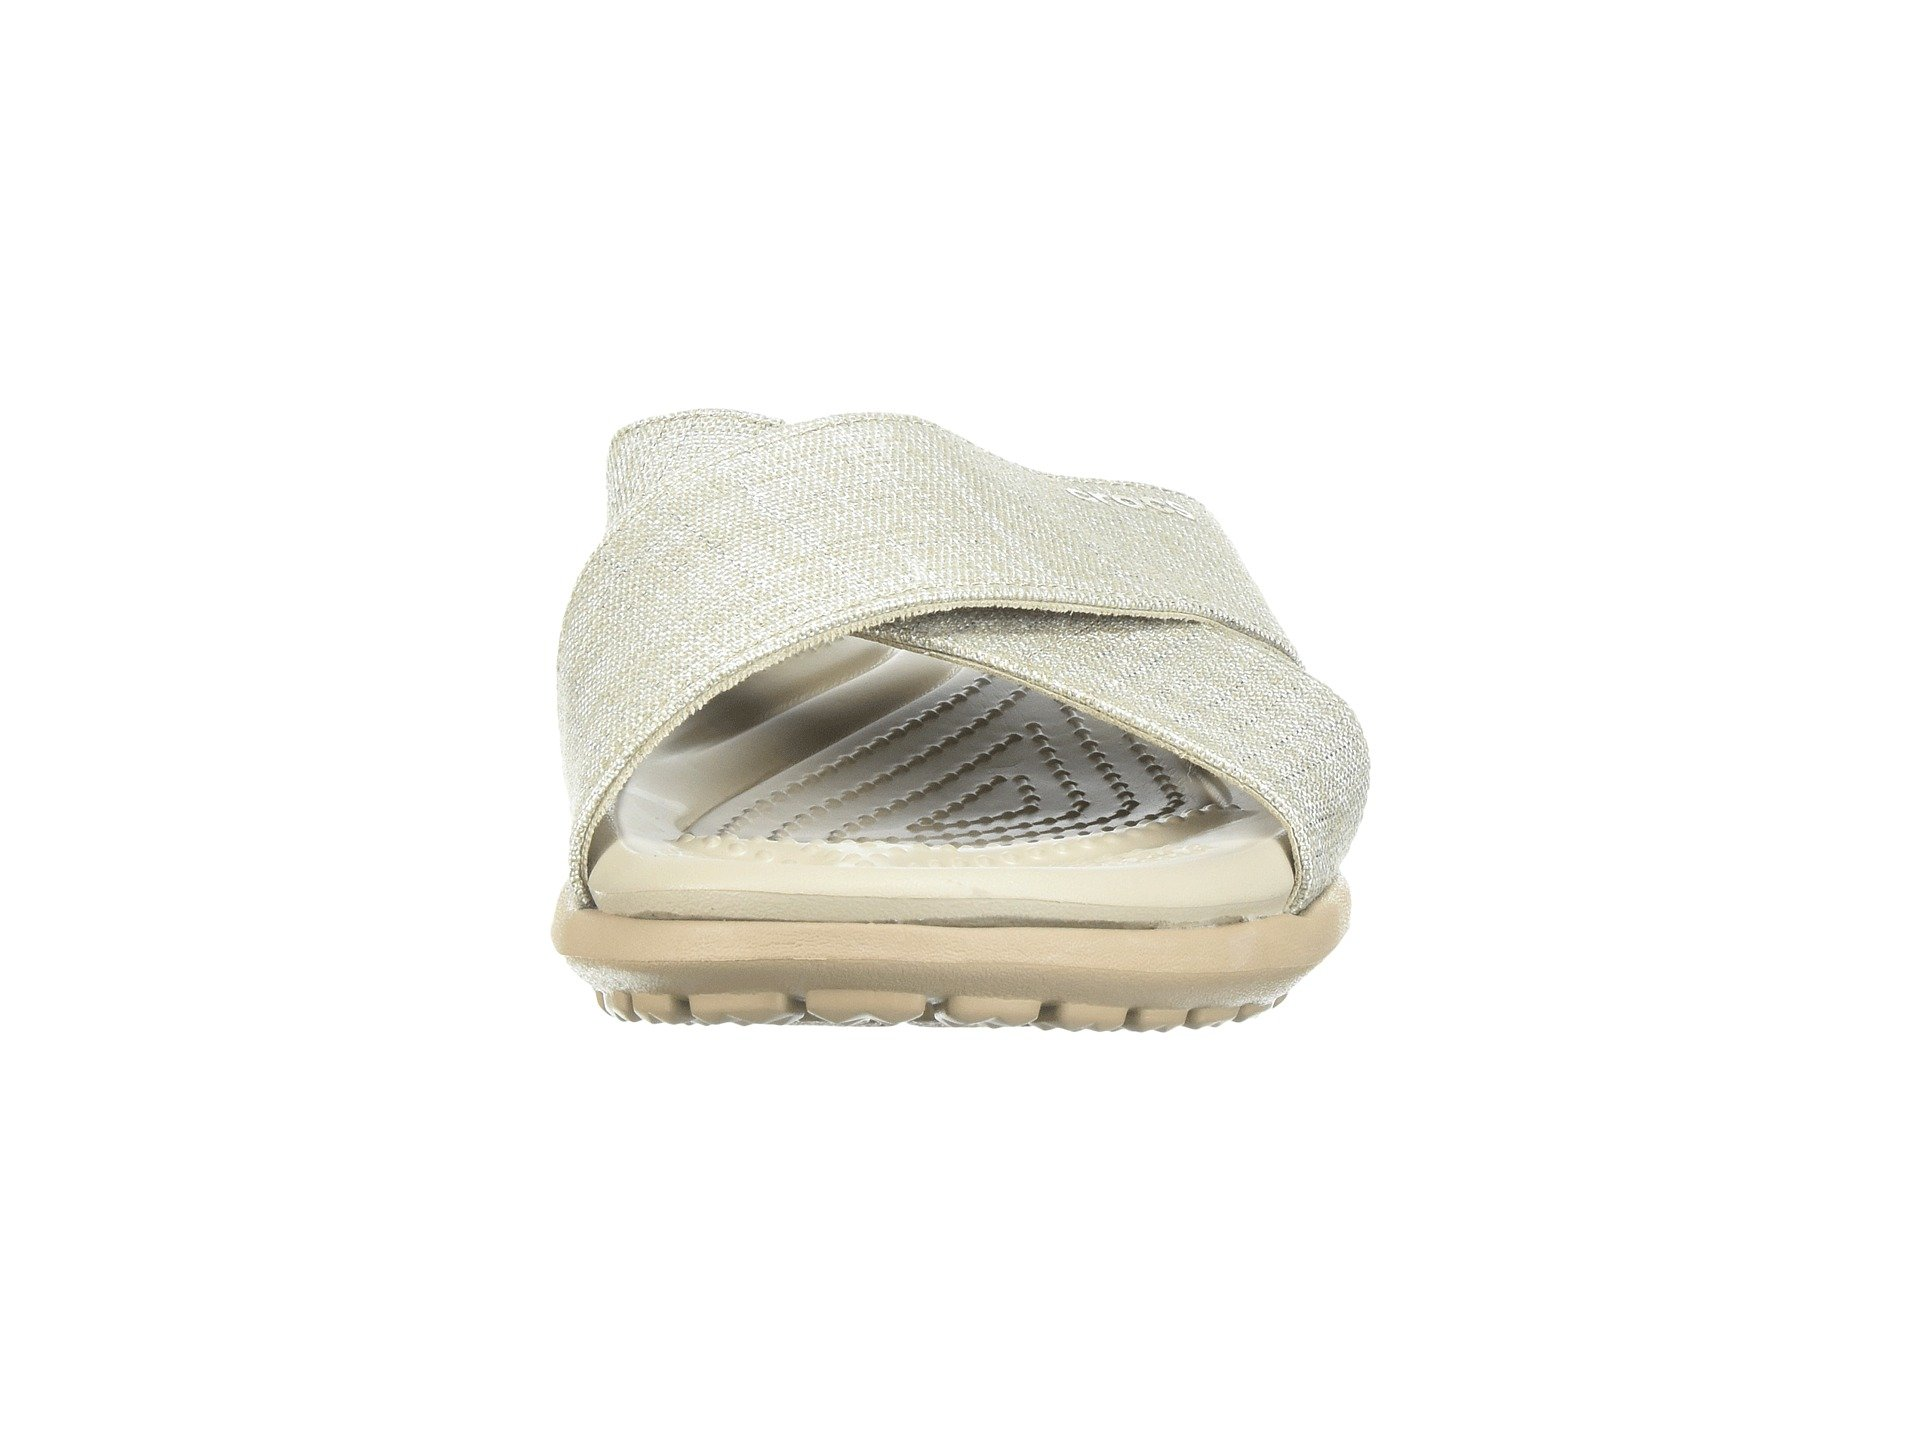 cobblestone Shimmer Xband Oyster Crocs Capri qU7wW5fT